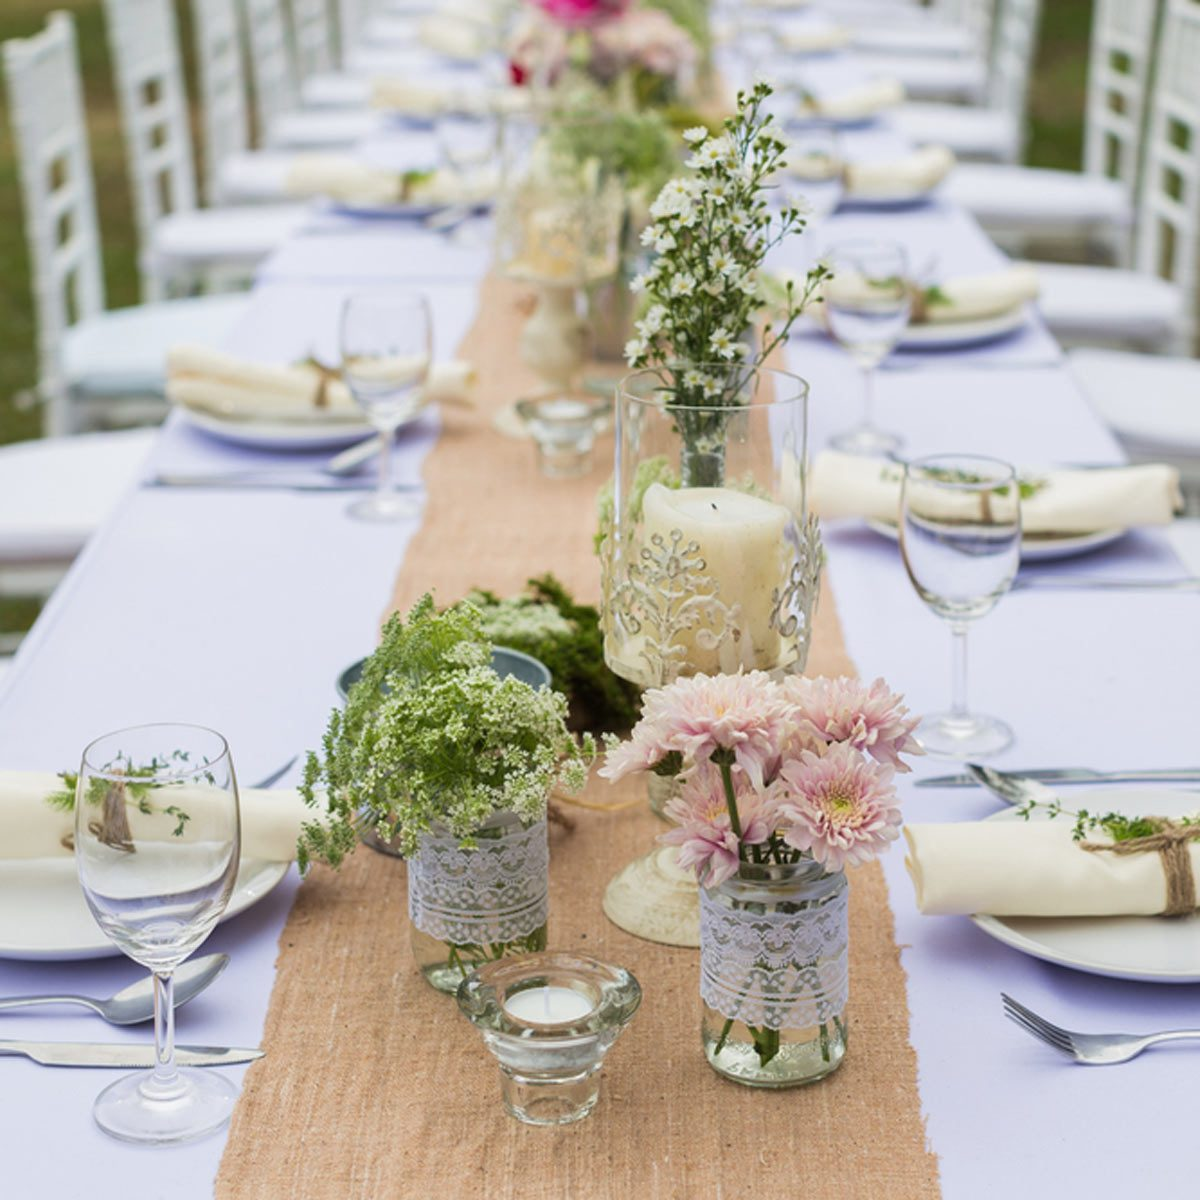 20 DIY Outdoor Wedding Decorations: DIY Wedding Decorations on Backyard Table Decor id=43707